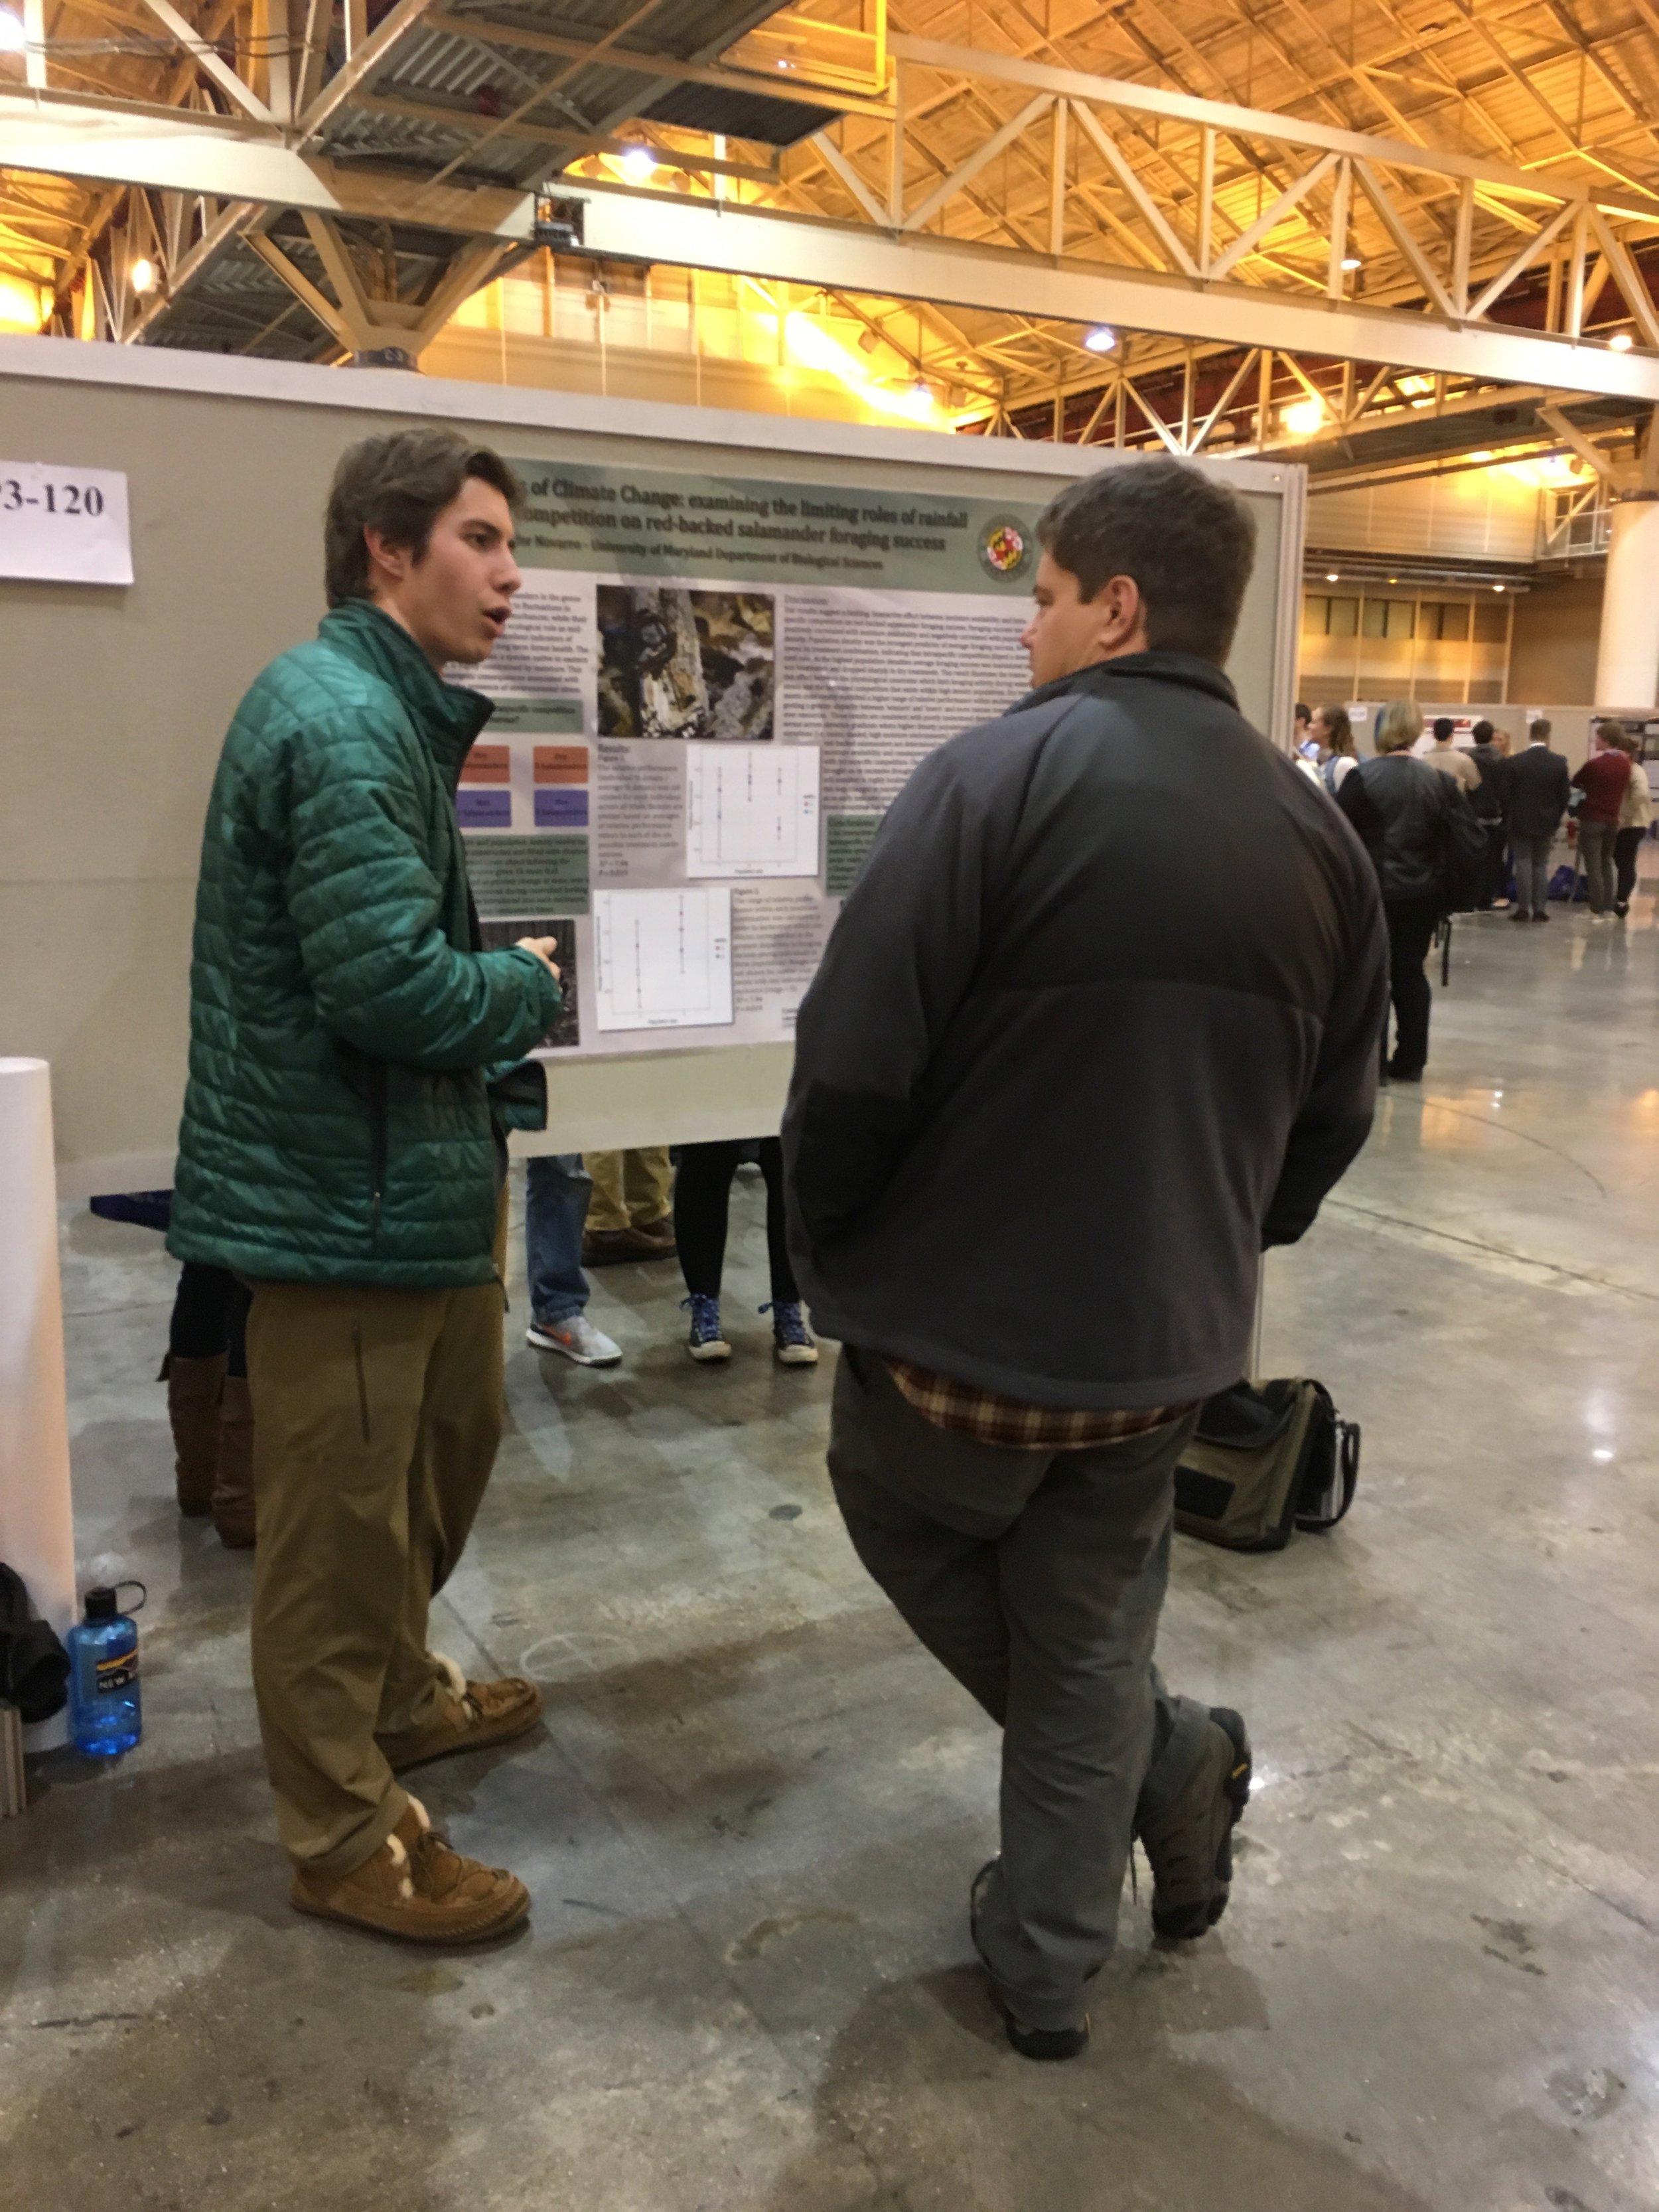 Matt presenting research at SICB